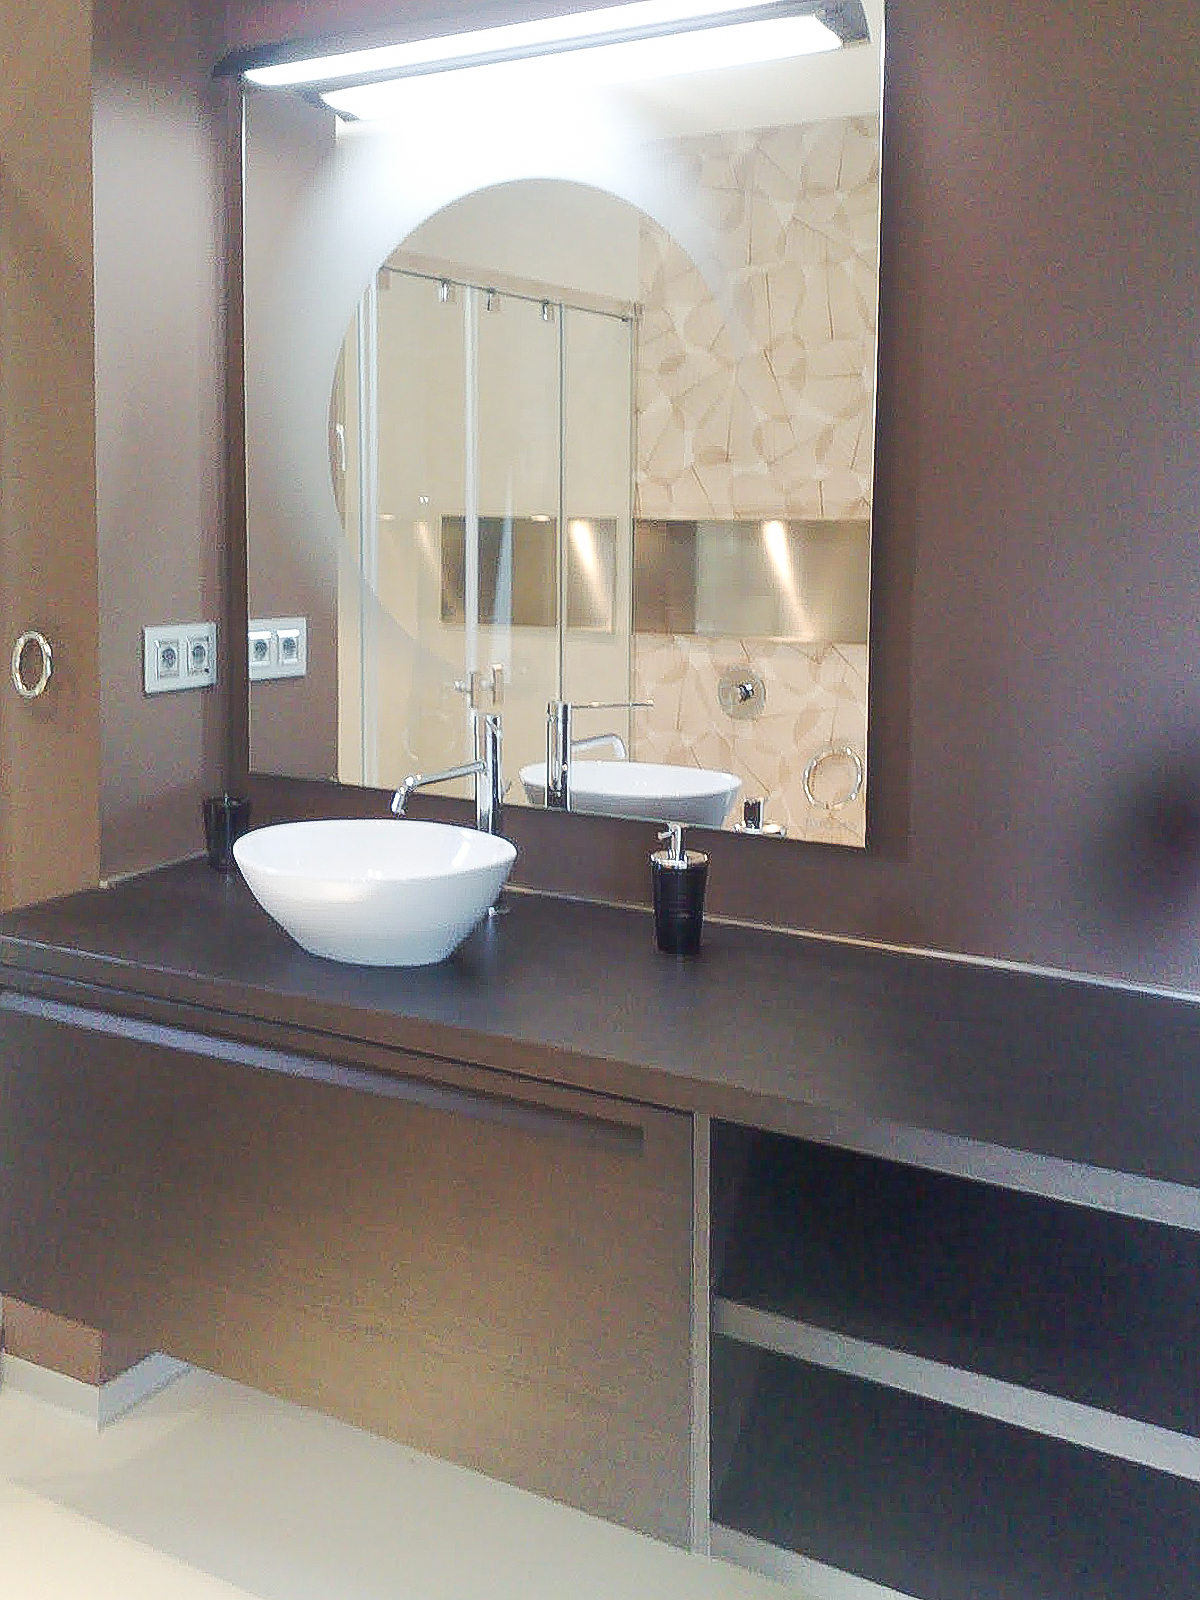 Modern bathroom vanity in dark wood with ceramic sink and square mirror